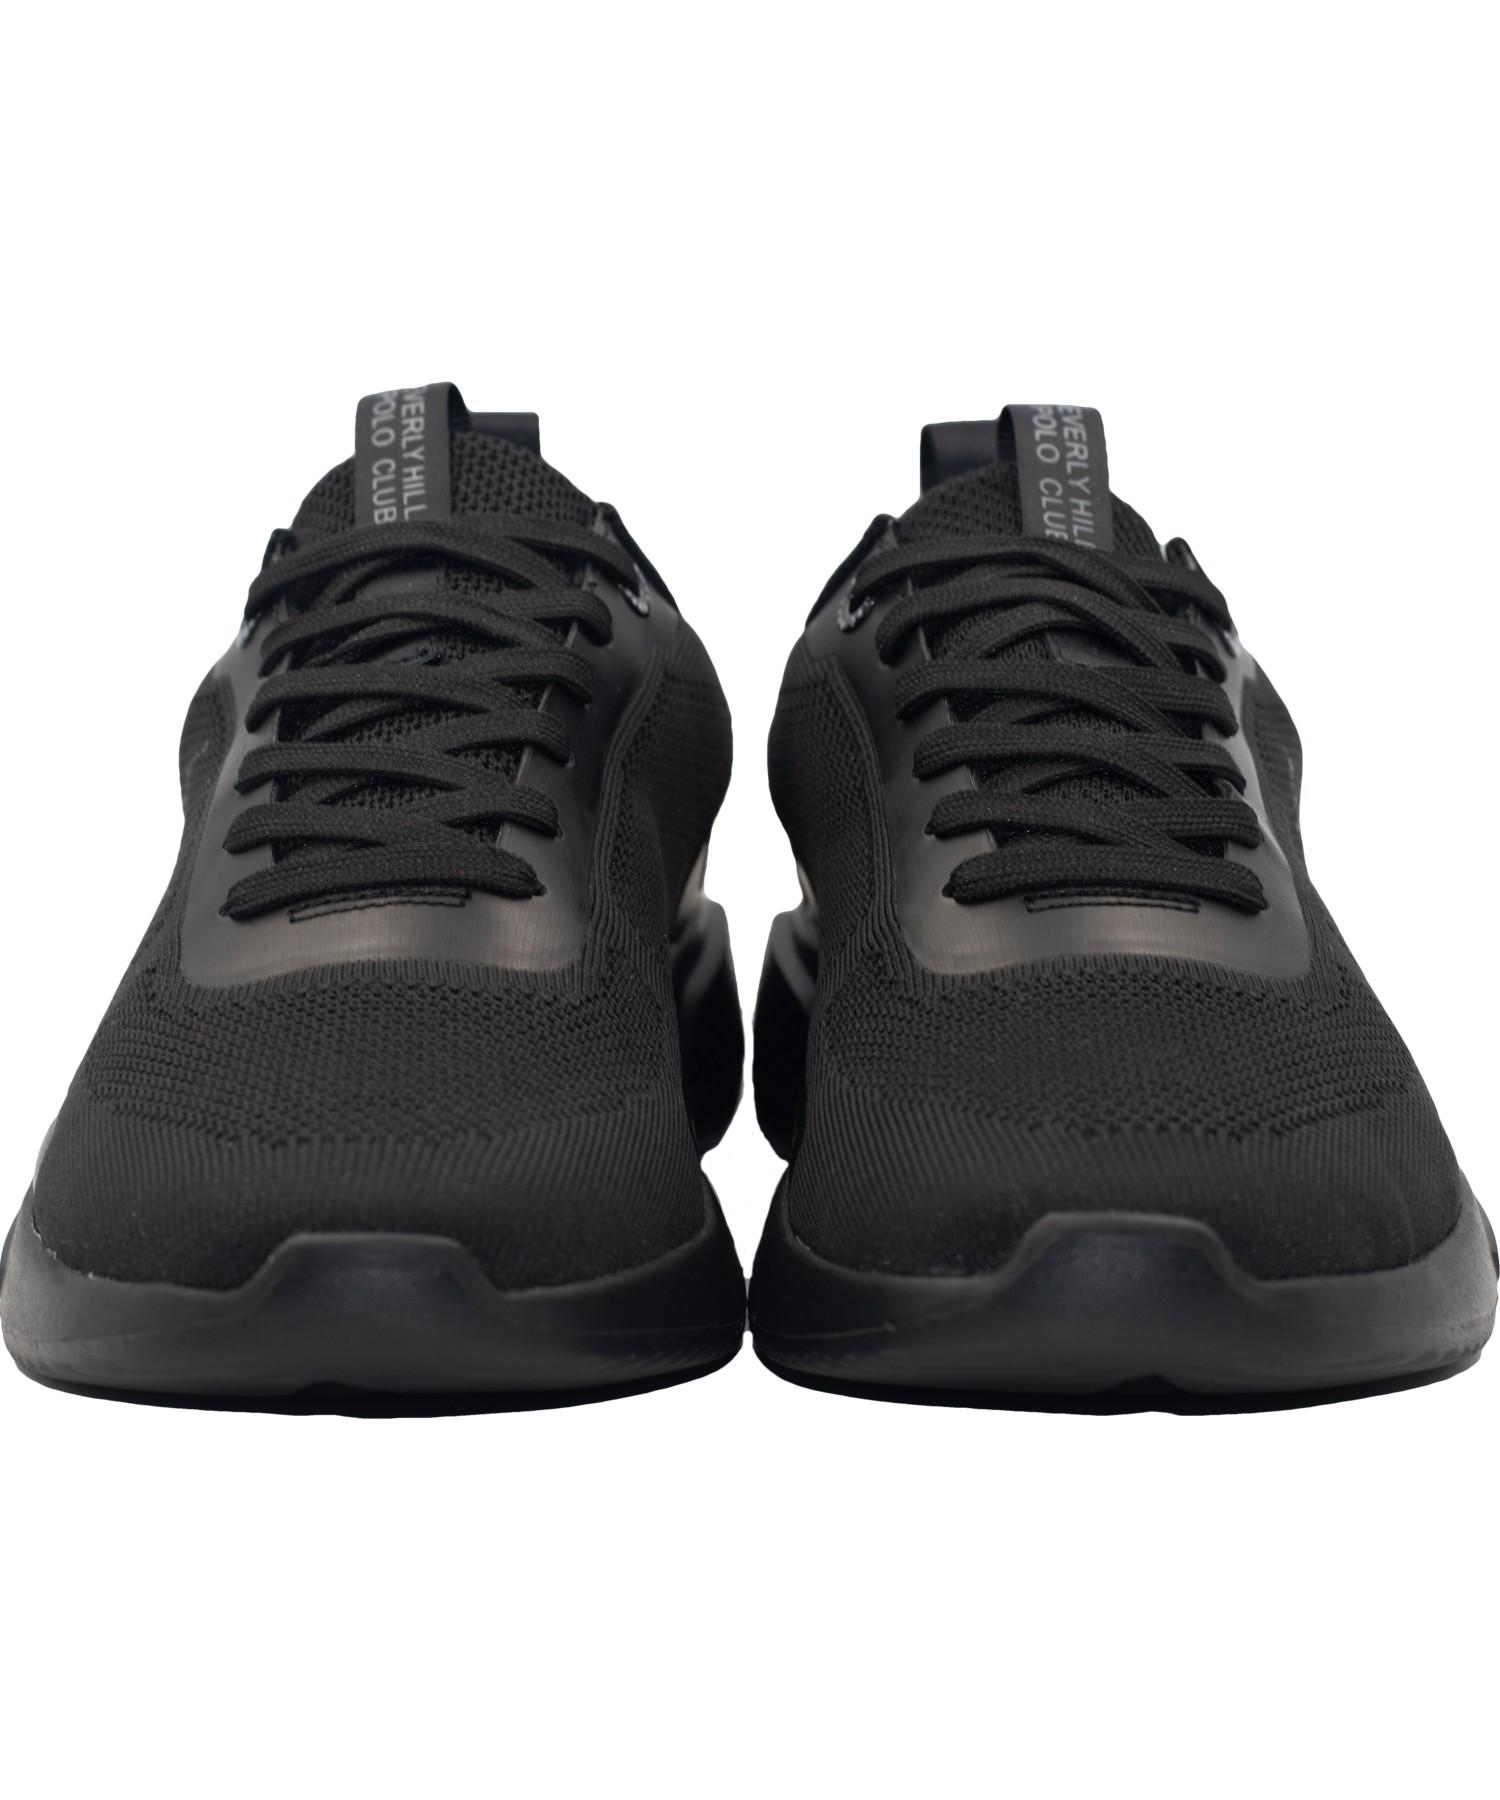 Zapatillas de Mujer Bhpc Lift Negro-Negro